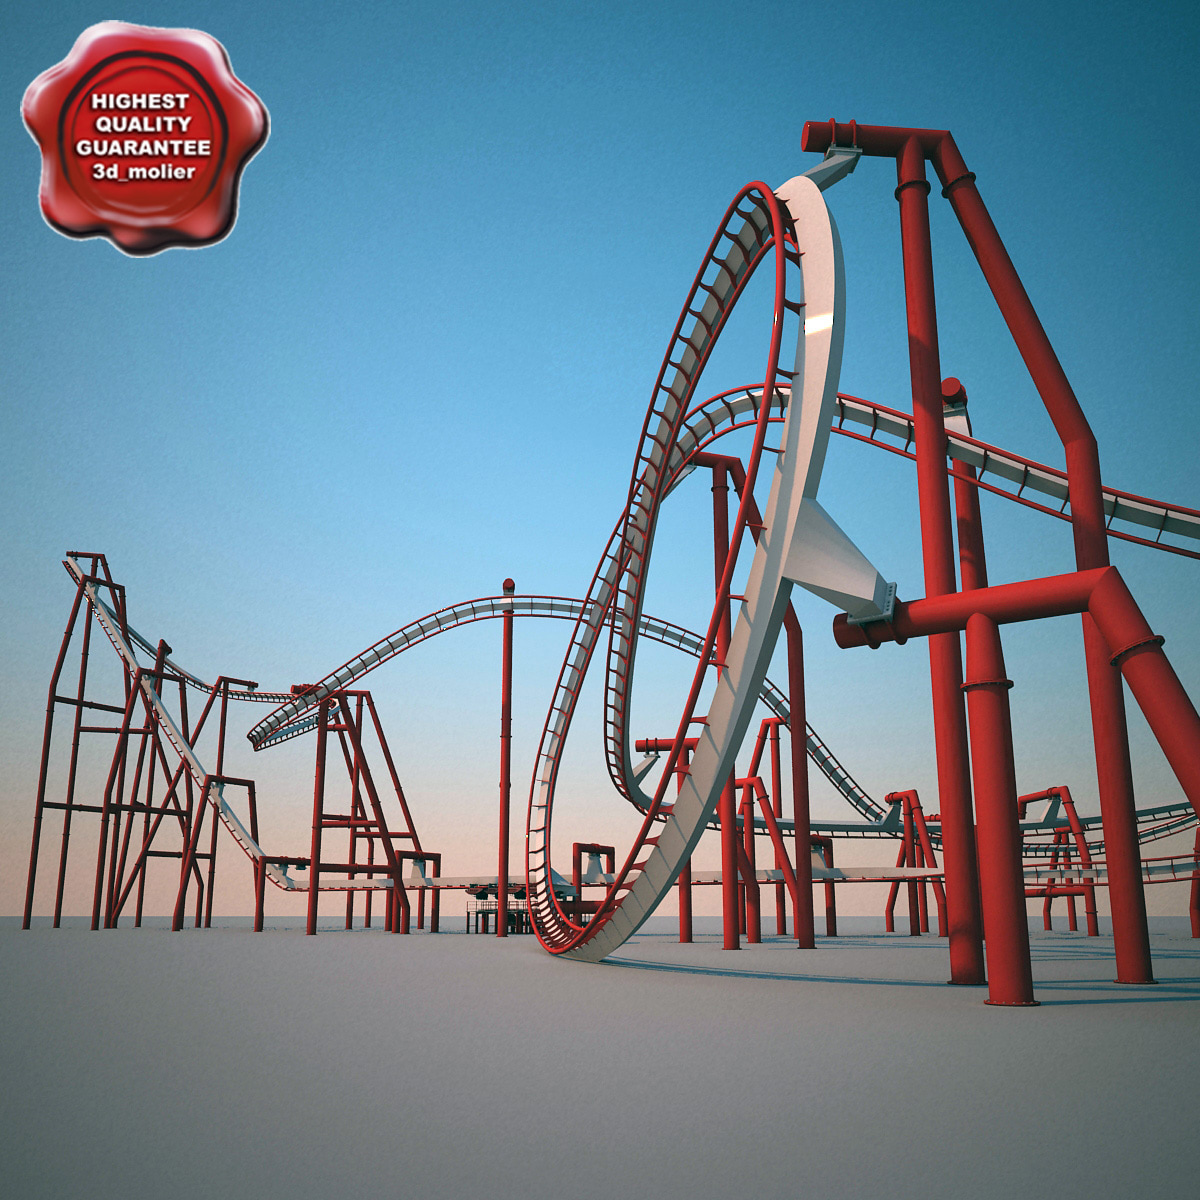 RollerCoster_00.jpg